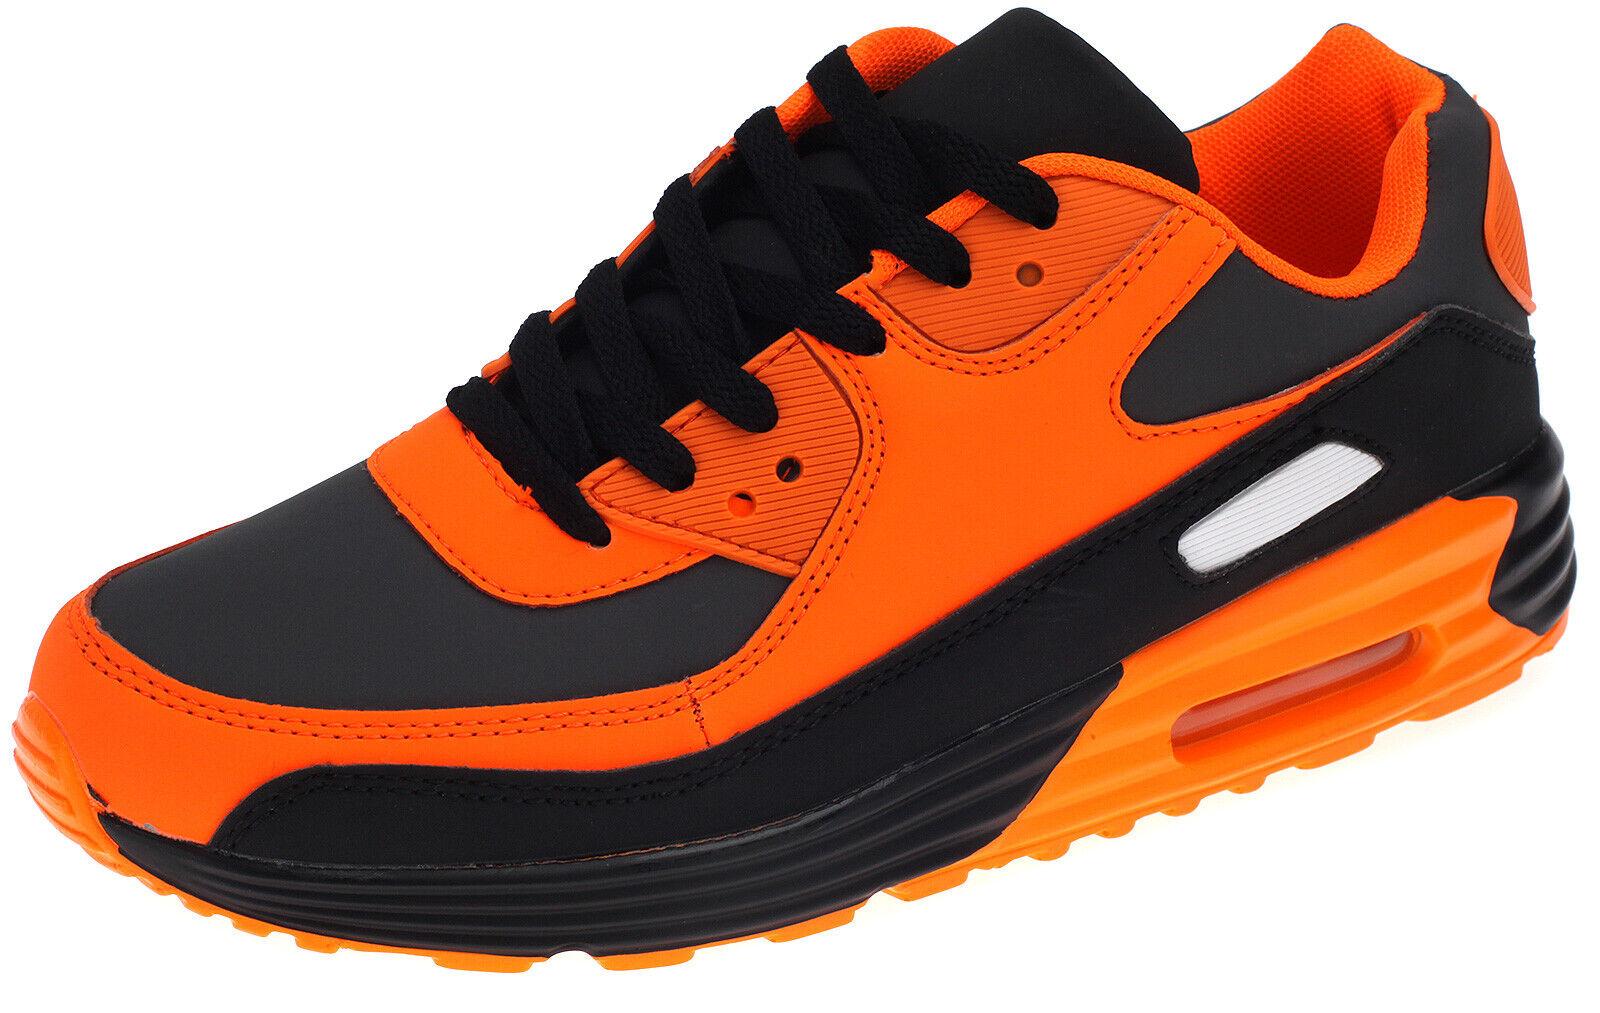 45. schwarz-orange-grau